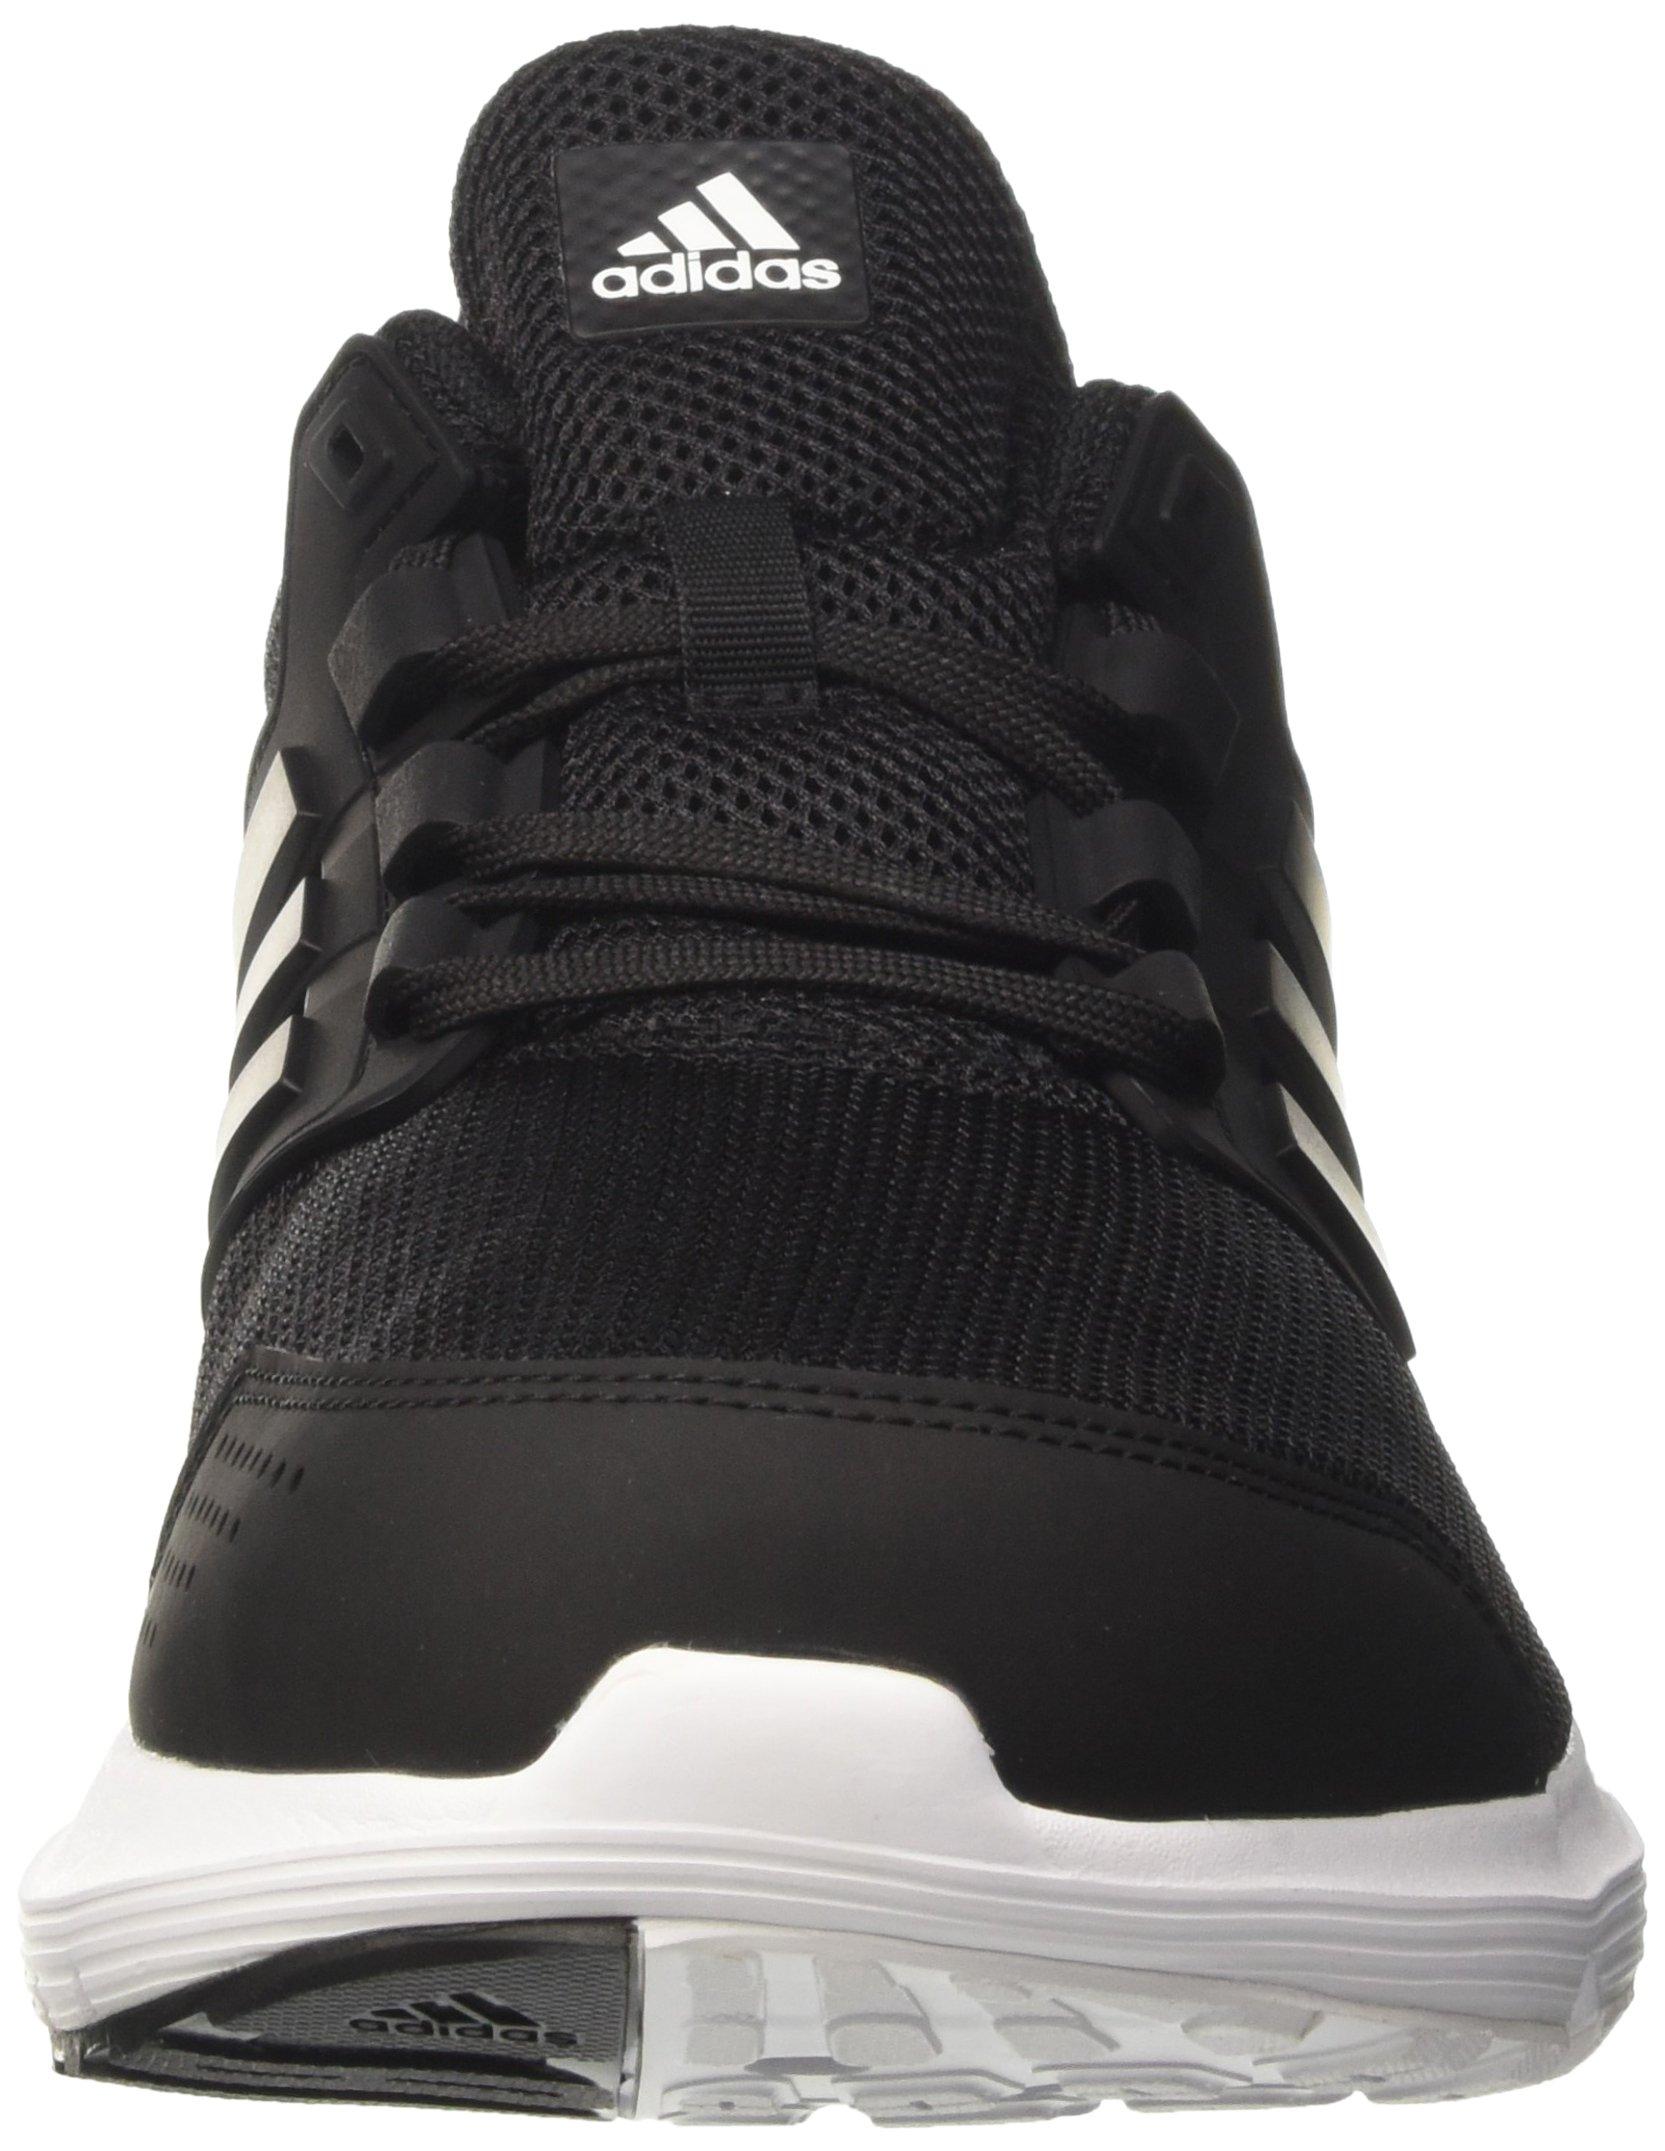 Adidas Galaxy 4 M, Scarpe da Running Uomo 4 spesavip